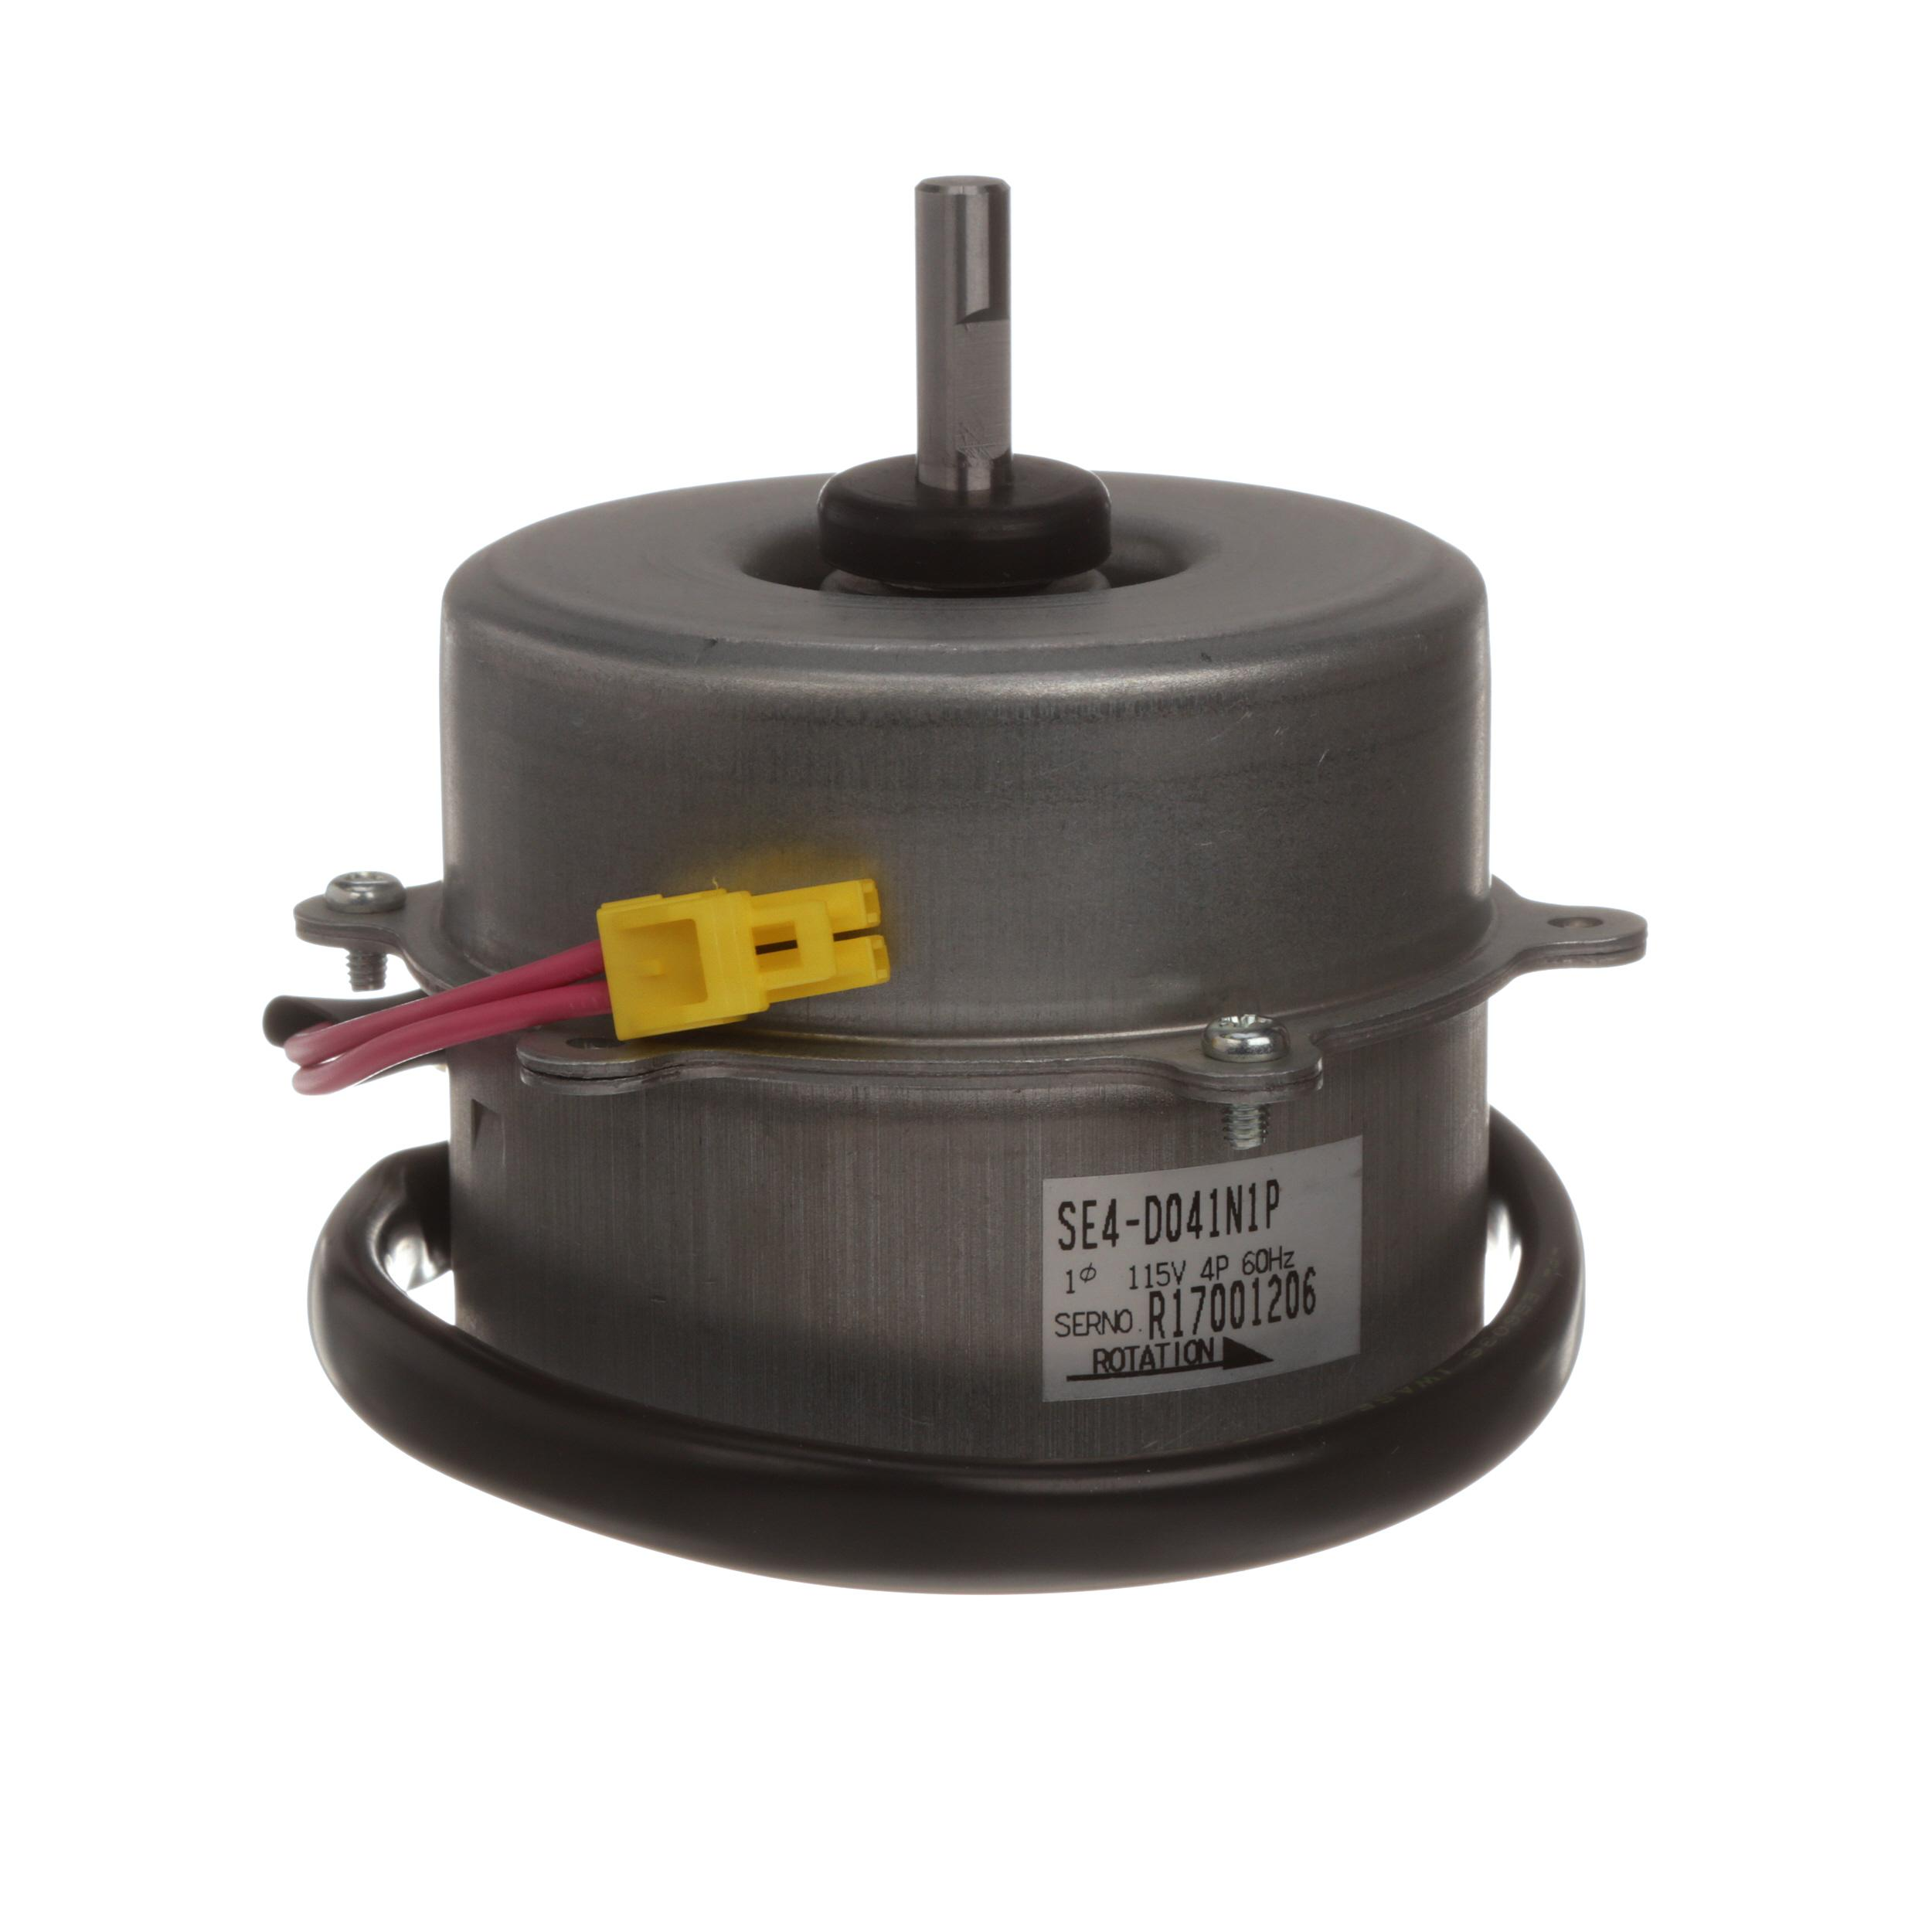 Belt Drive Pressure Washer Pump Replacement Mitm Cwc